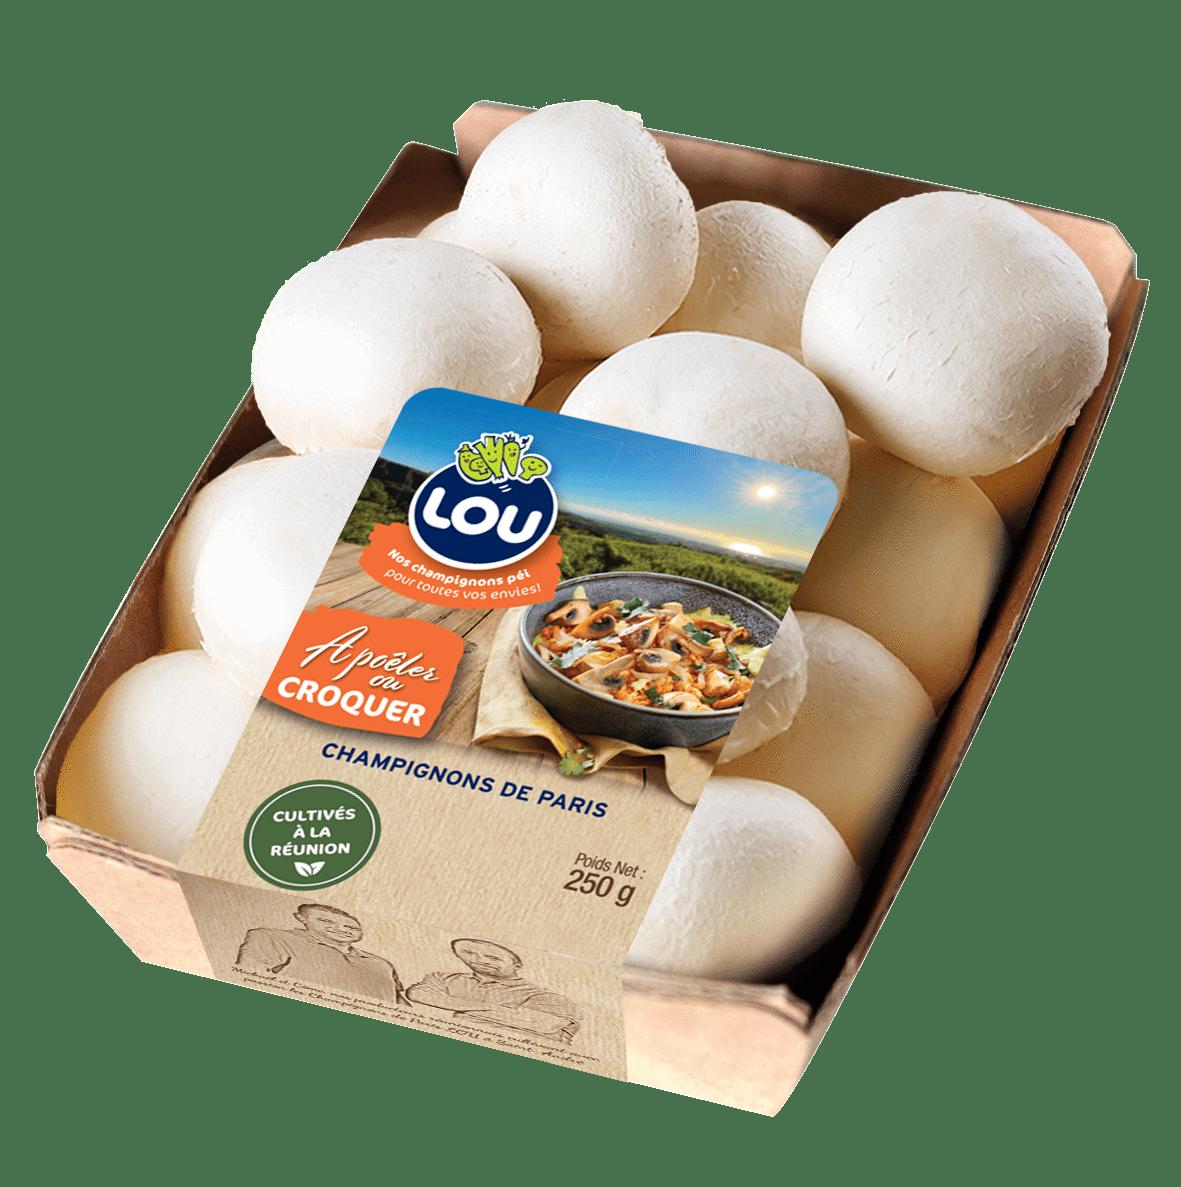 lou_champignons_974_pack5